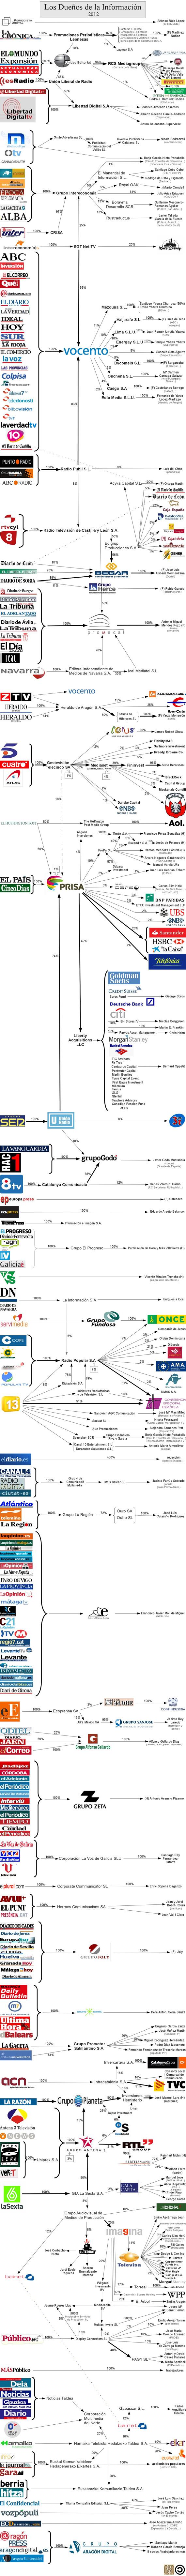 2012-09-05-mapa_medios.jpg